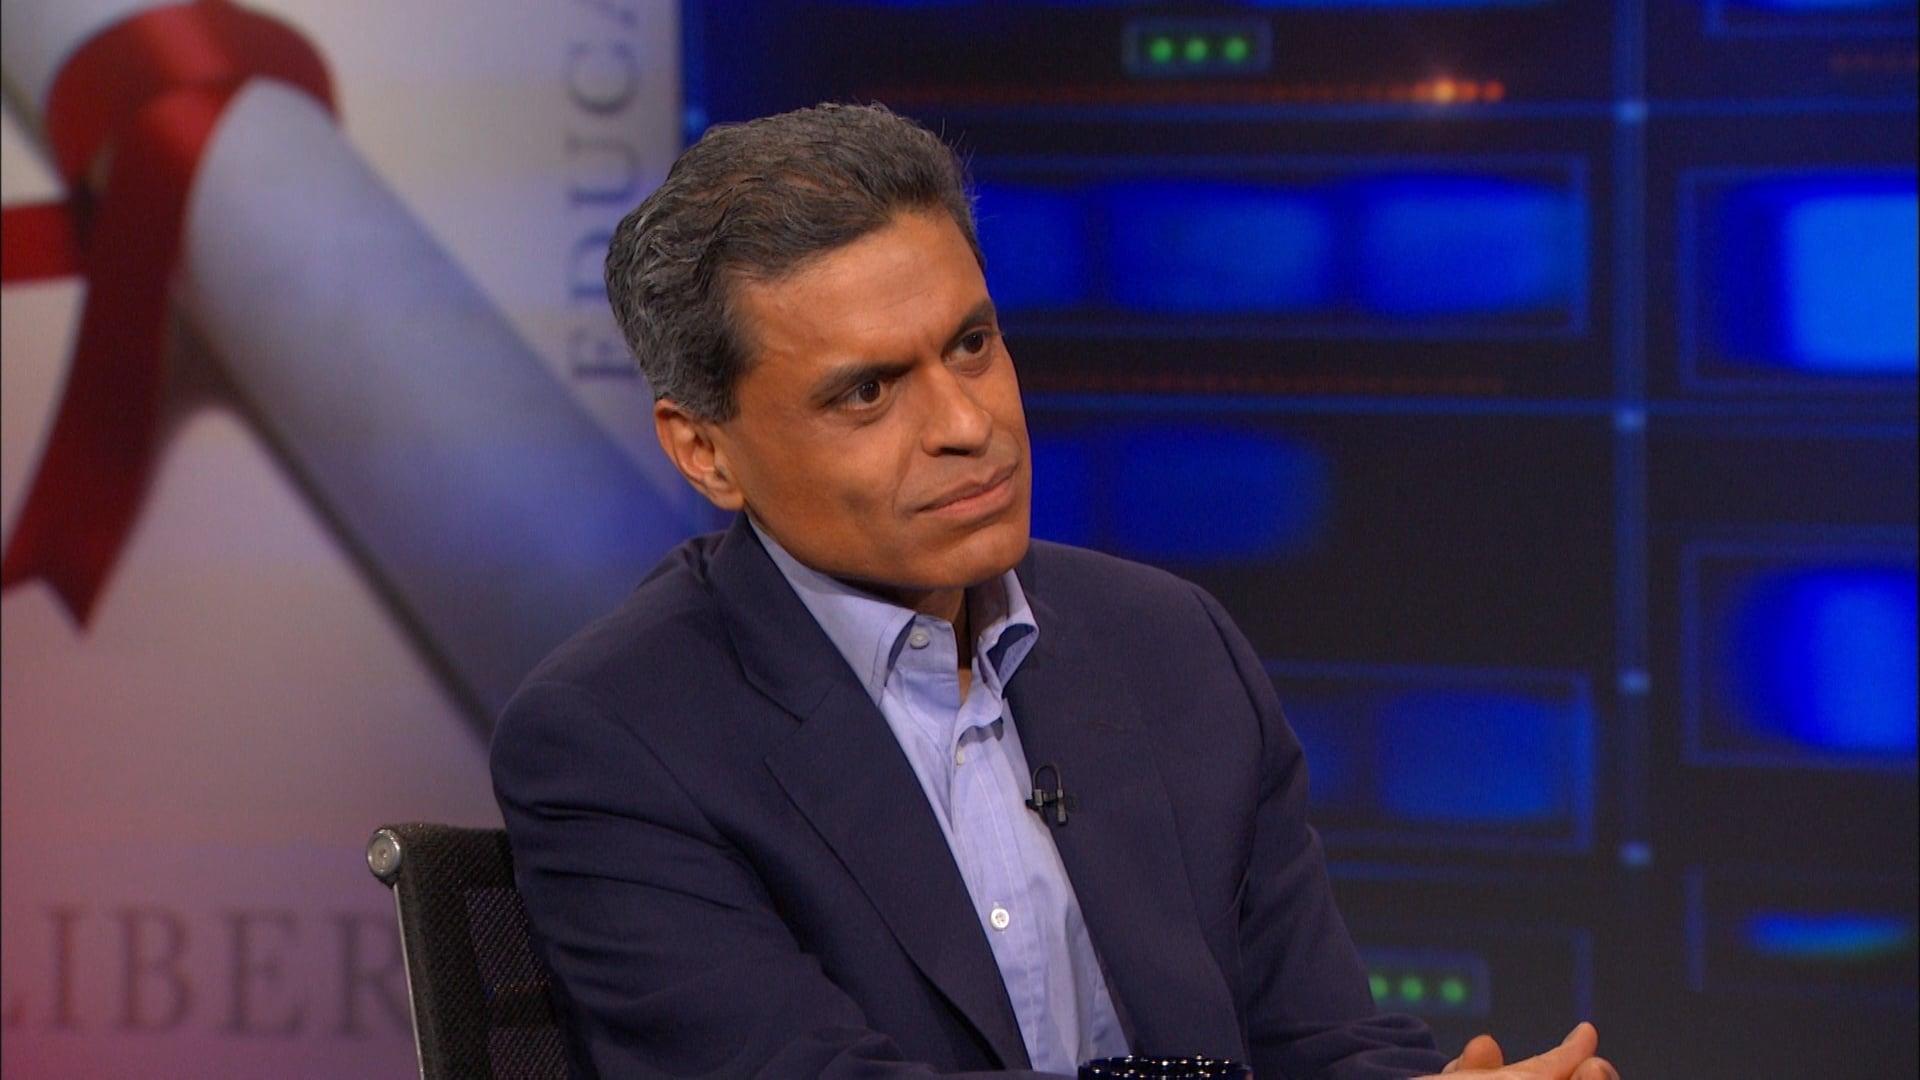 The Daily Show with Trevor Noah Season 20 :Episode 89  Fareed Zakaria